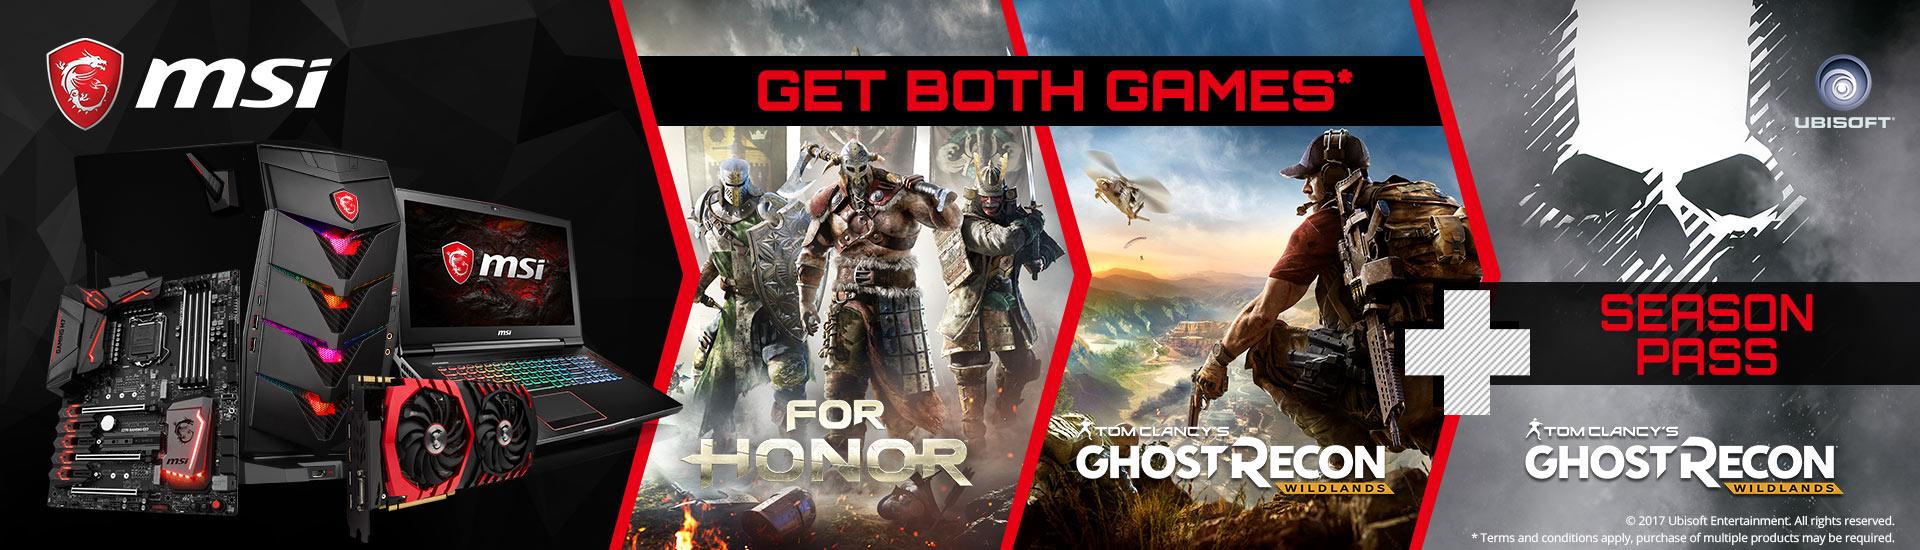 MSI Gaming Motherboard – For Honor Game Bundle